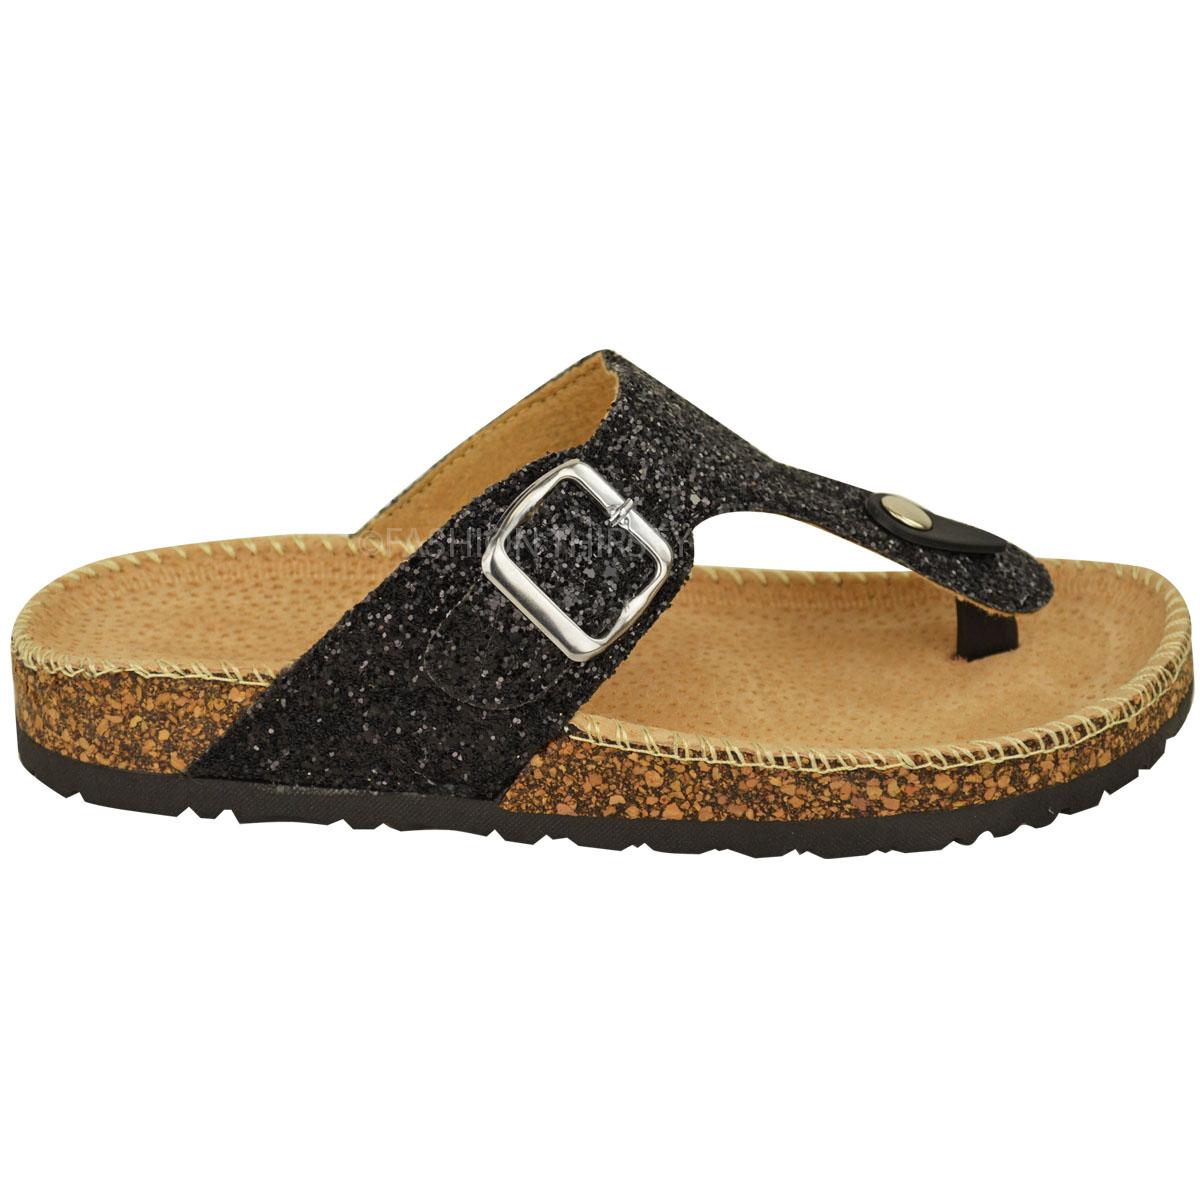 2d87dd59036 Ladies Womens Flat Sandals Glitter Flip Flops Slip On Toe Post Thong ...